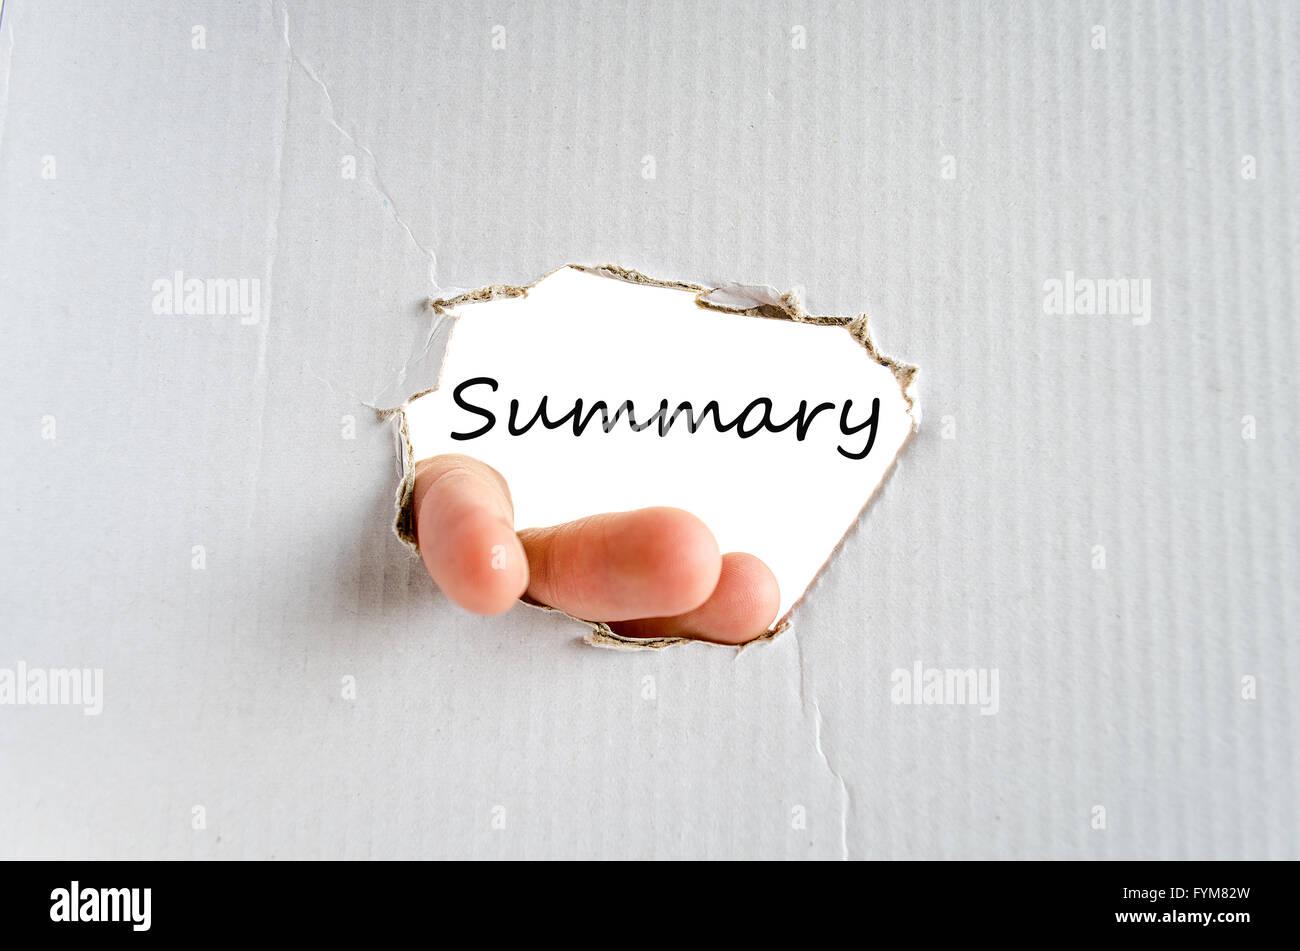 Summary concept - Stock Image